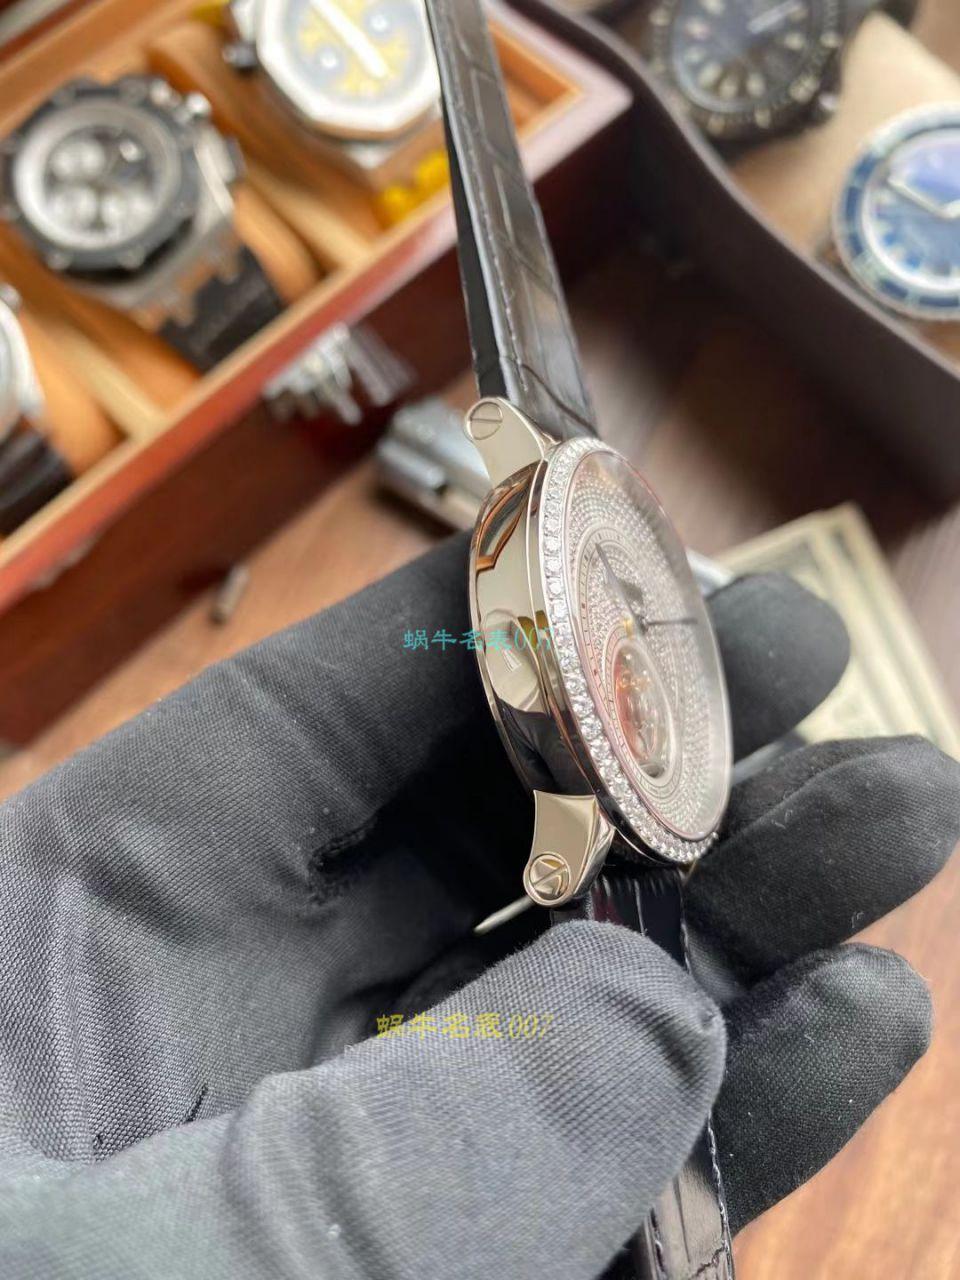 BBR厂卡地亚高级制表陀飞轮1比1精仿手表HPI00593腕表 / K336